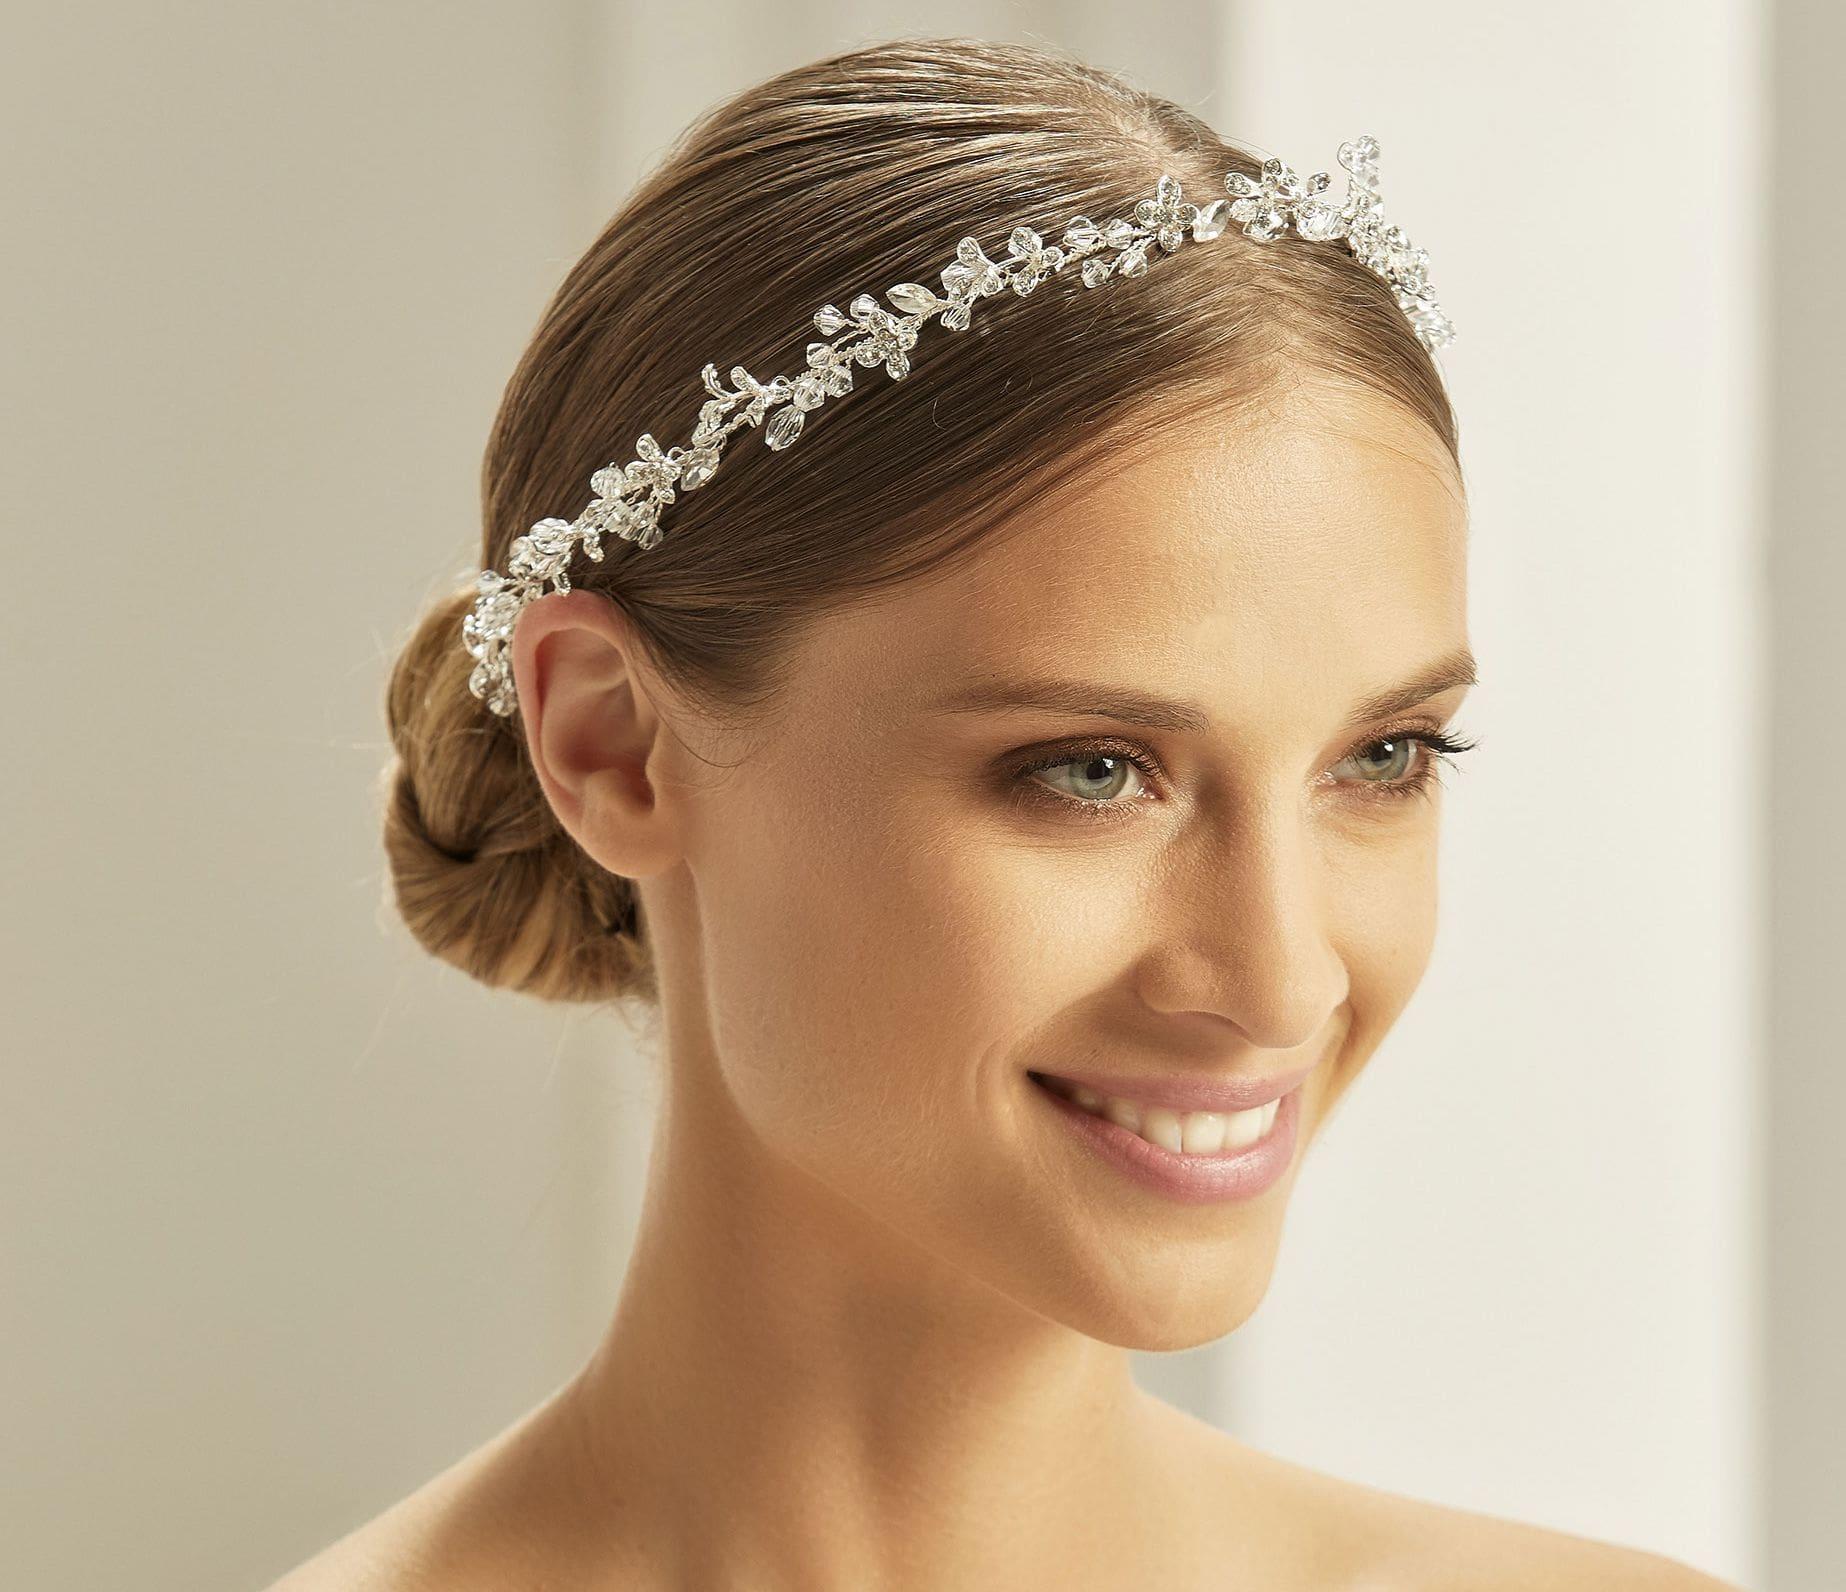 Haarband No. 2882